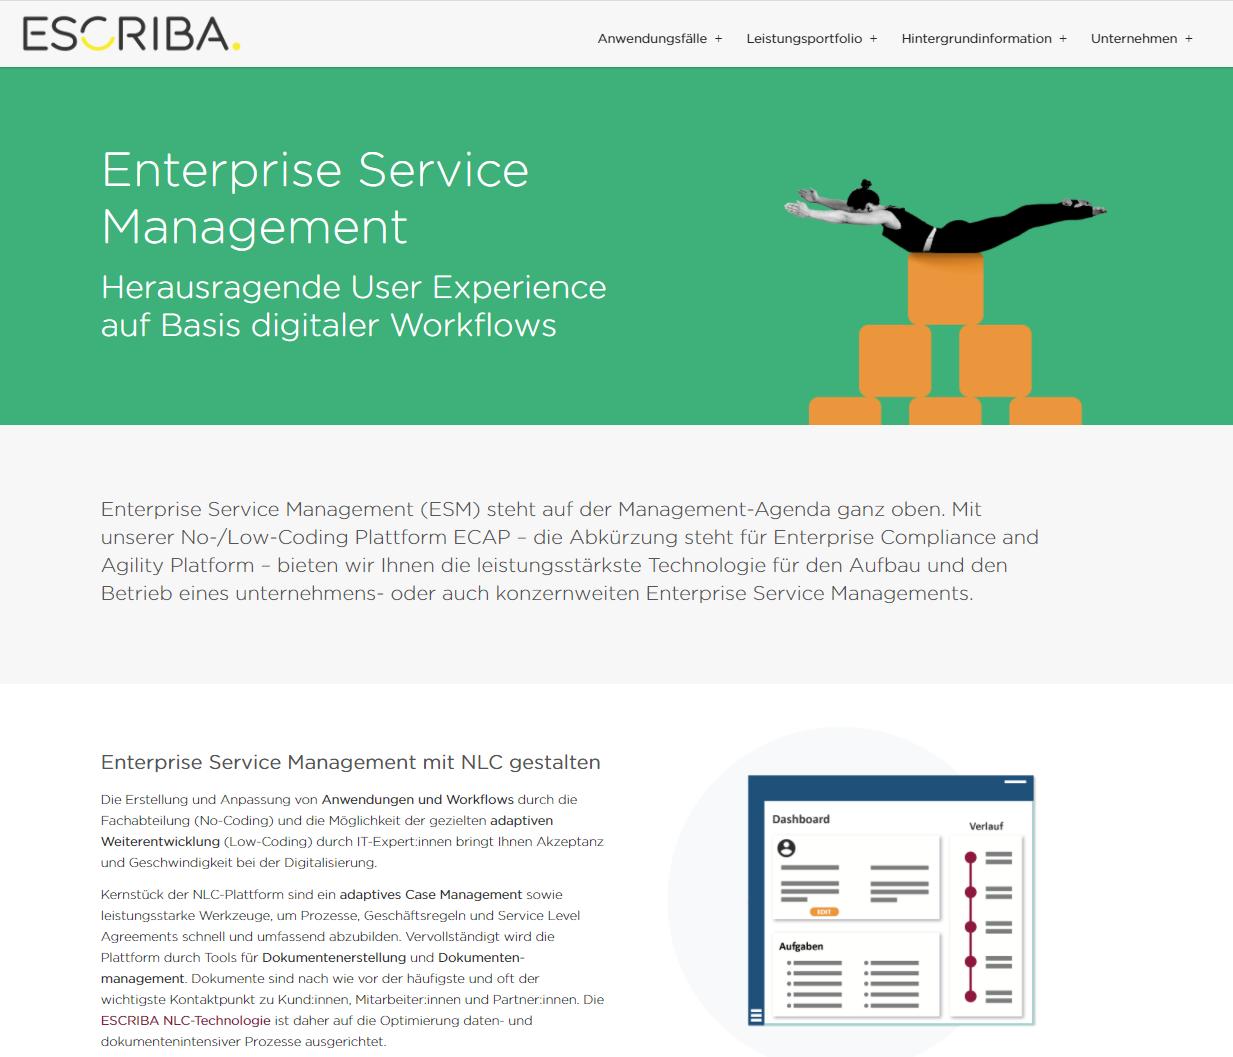 ESCRIBA Enterprise Service Management